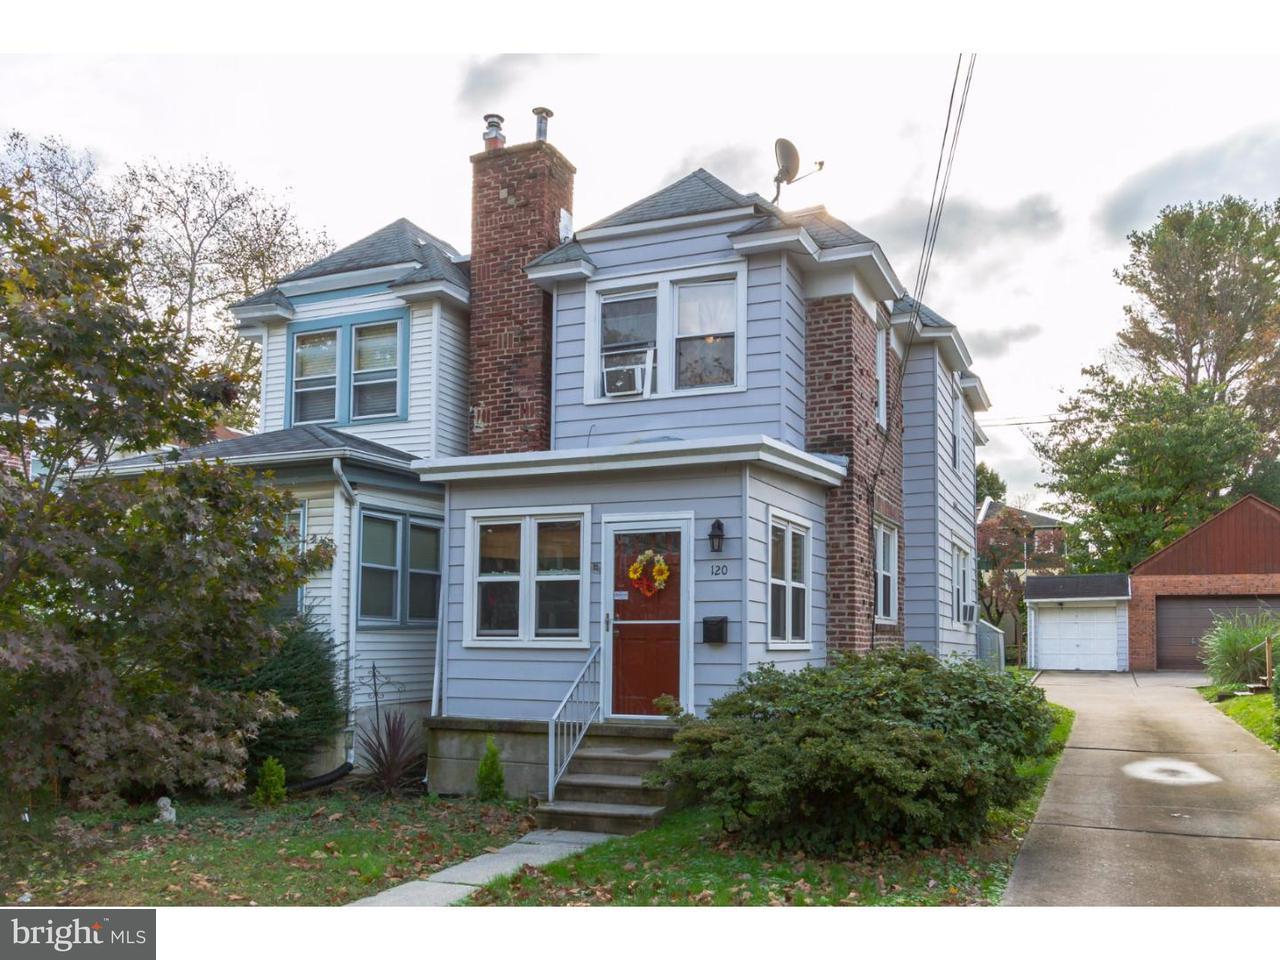 120 W Plumstead Lansdowne, PA 19050